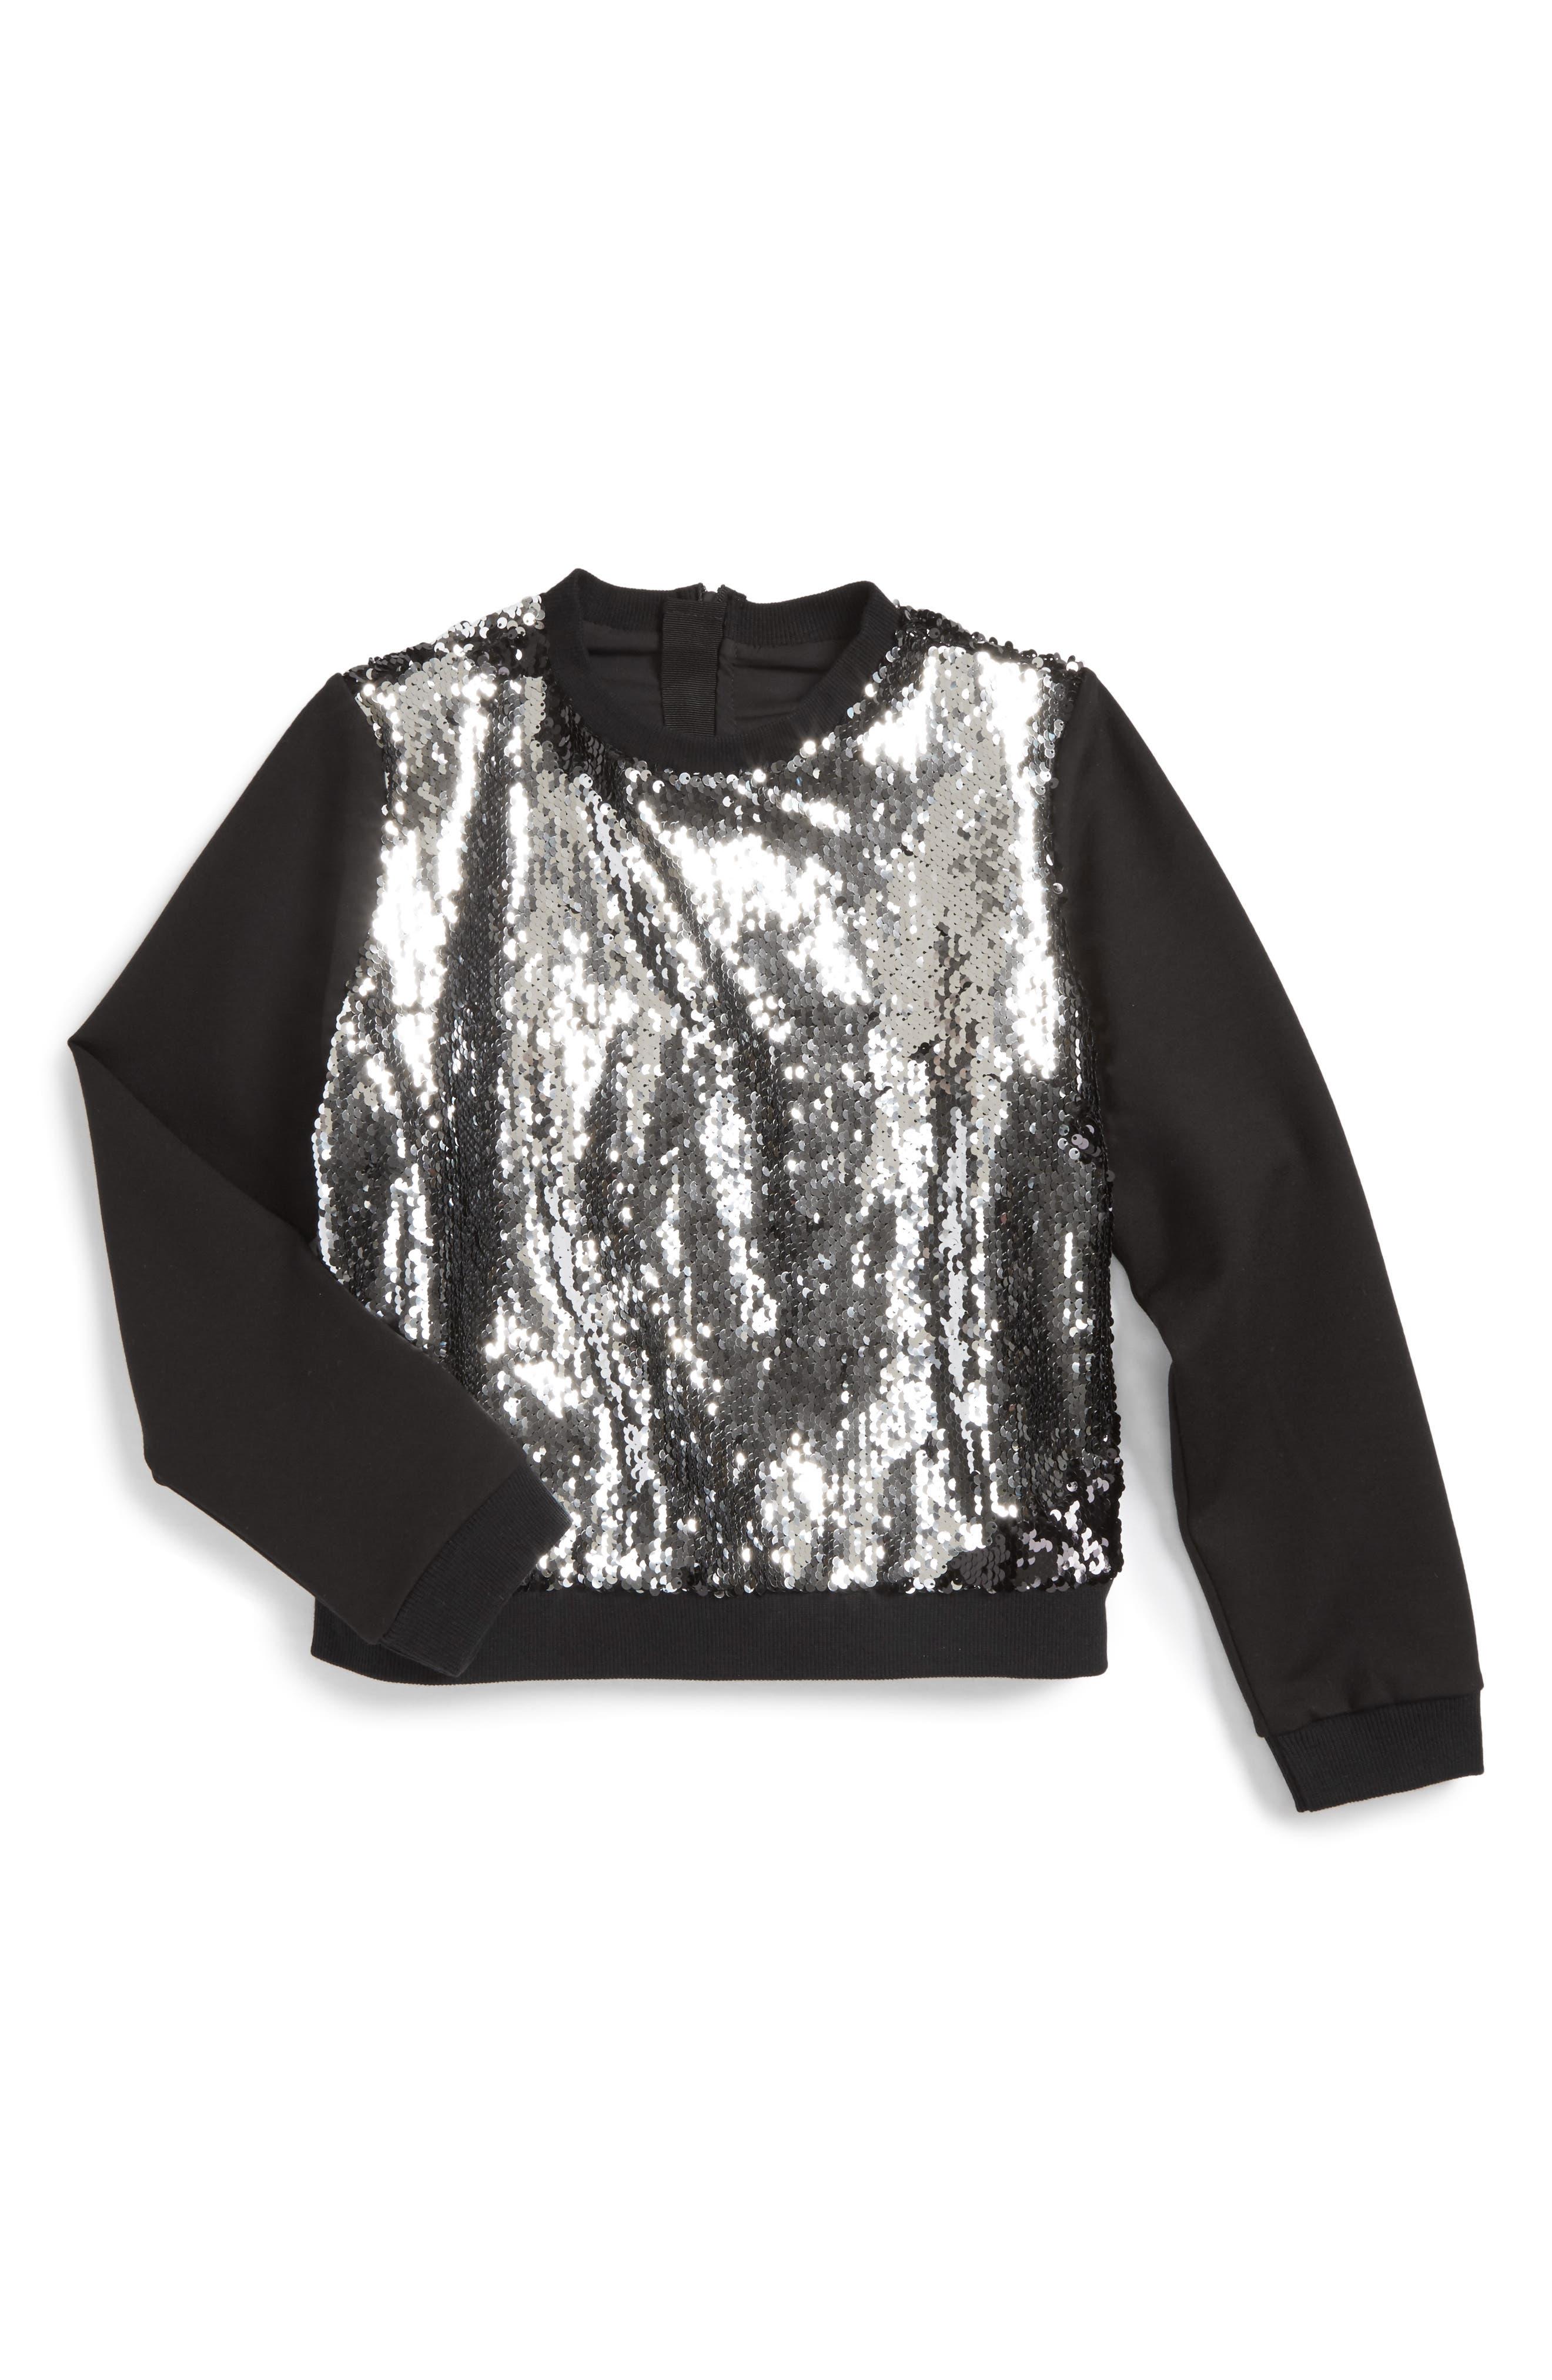 Alternate Image 1 Selected - Milly Minis Sequin Sweatshirt (Toddler Girls, Little Girls & Big Girls)